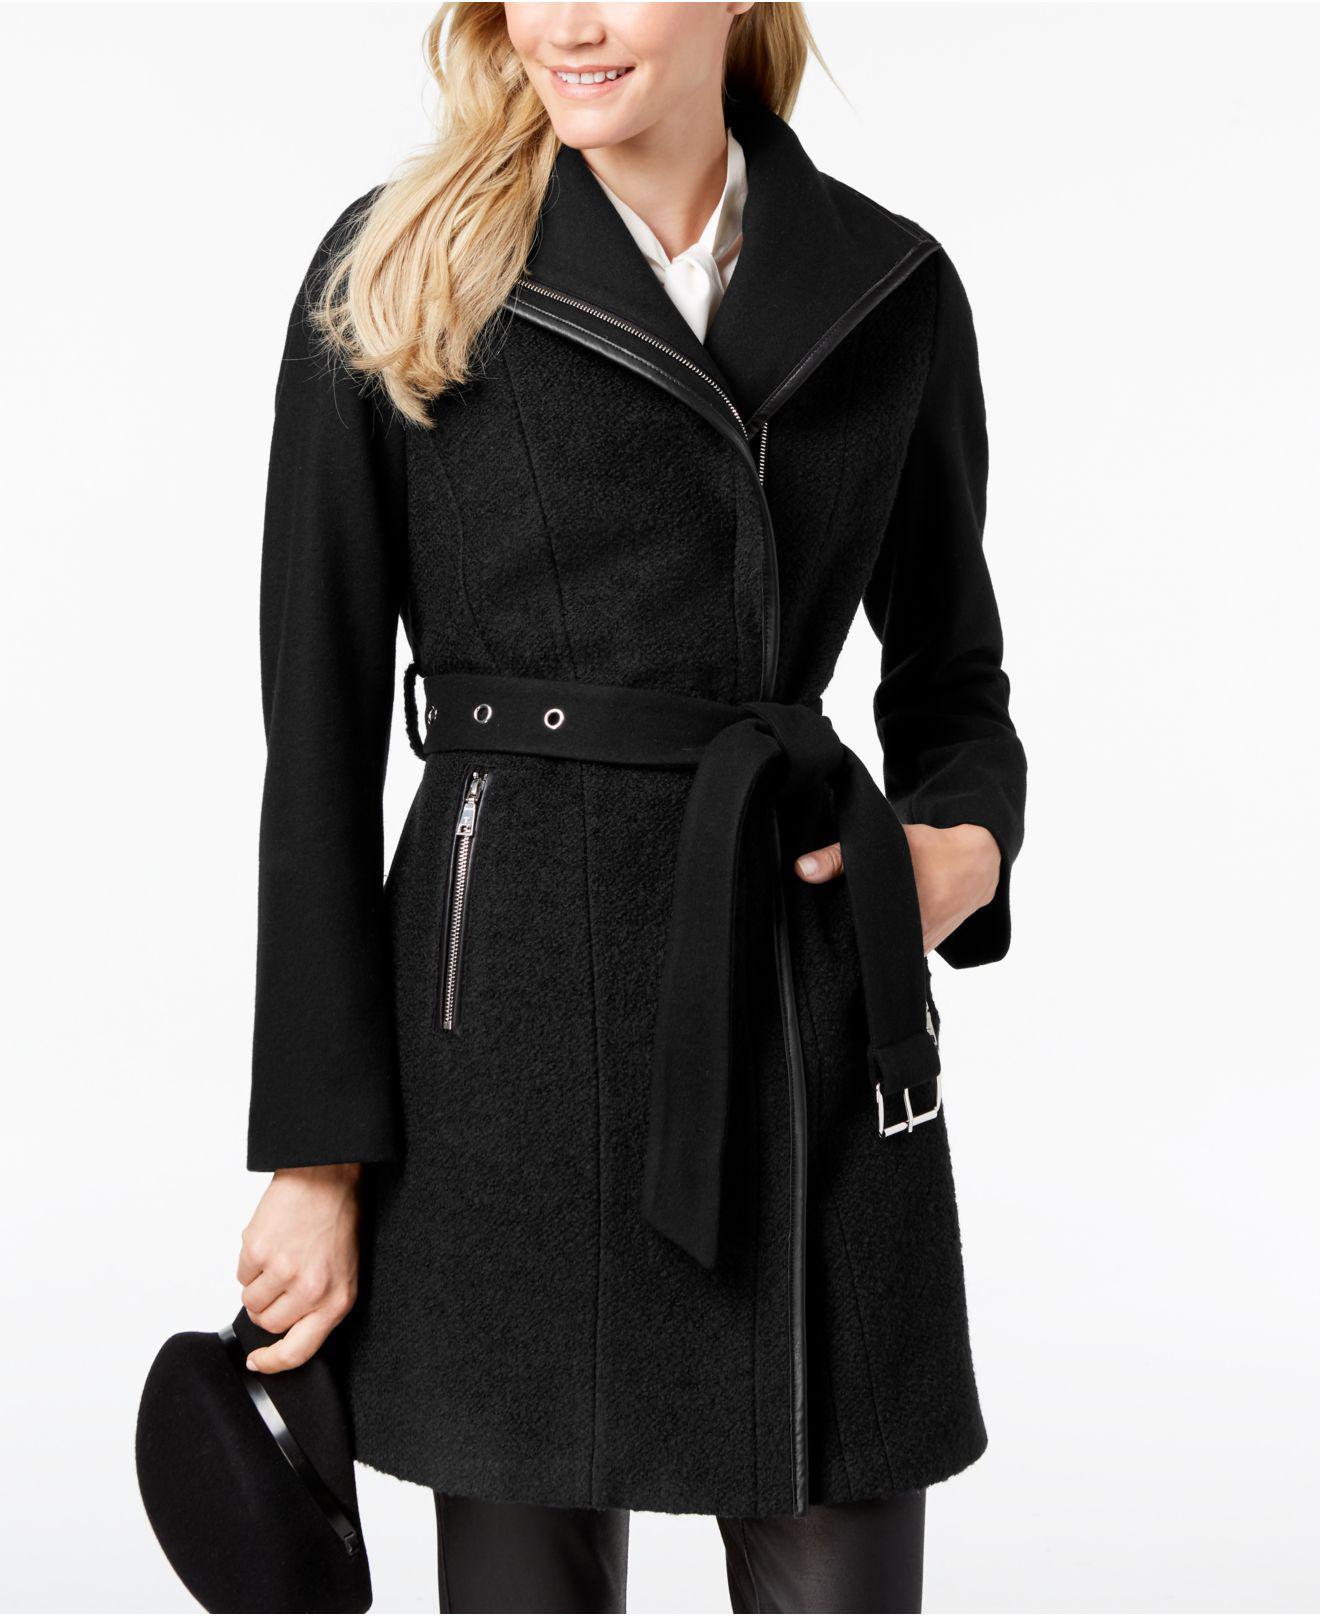 bf7e557c5def8 Lyst - T Tahari Elaine Asymmetrical Belted Coat in Black